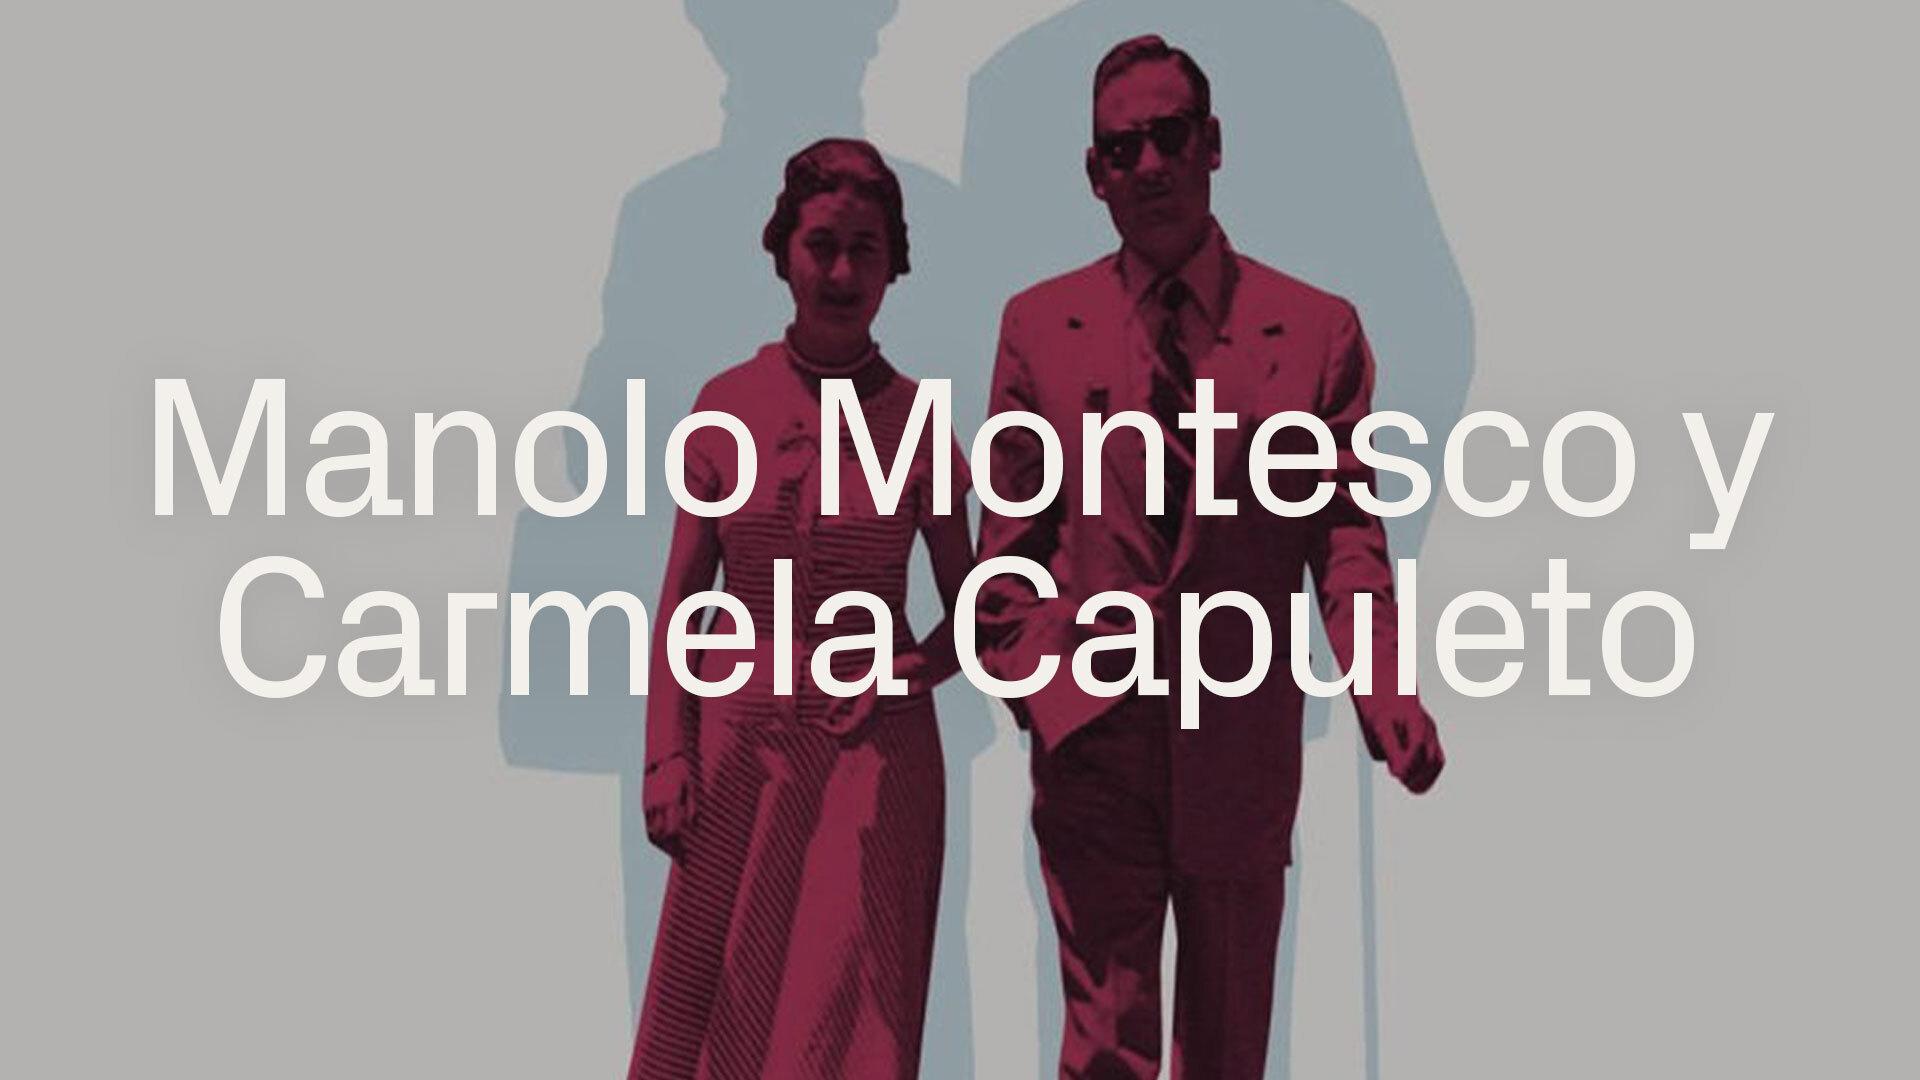 Manolo Montesco y Carmela Capuleto betevé